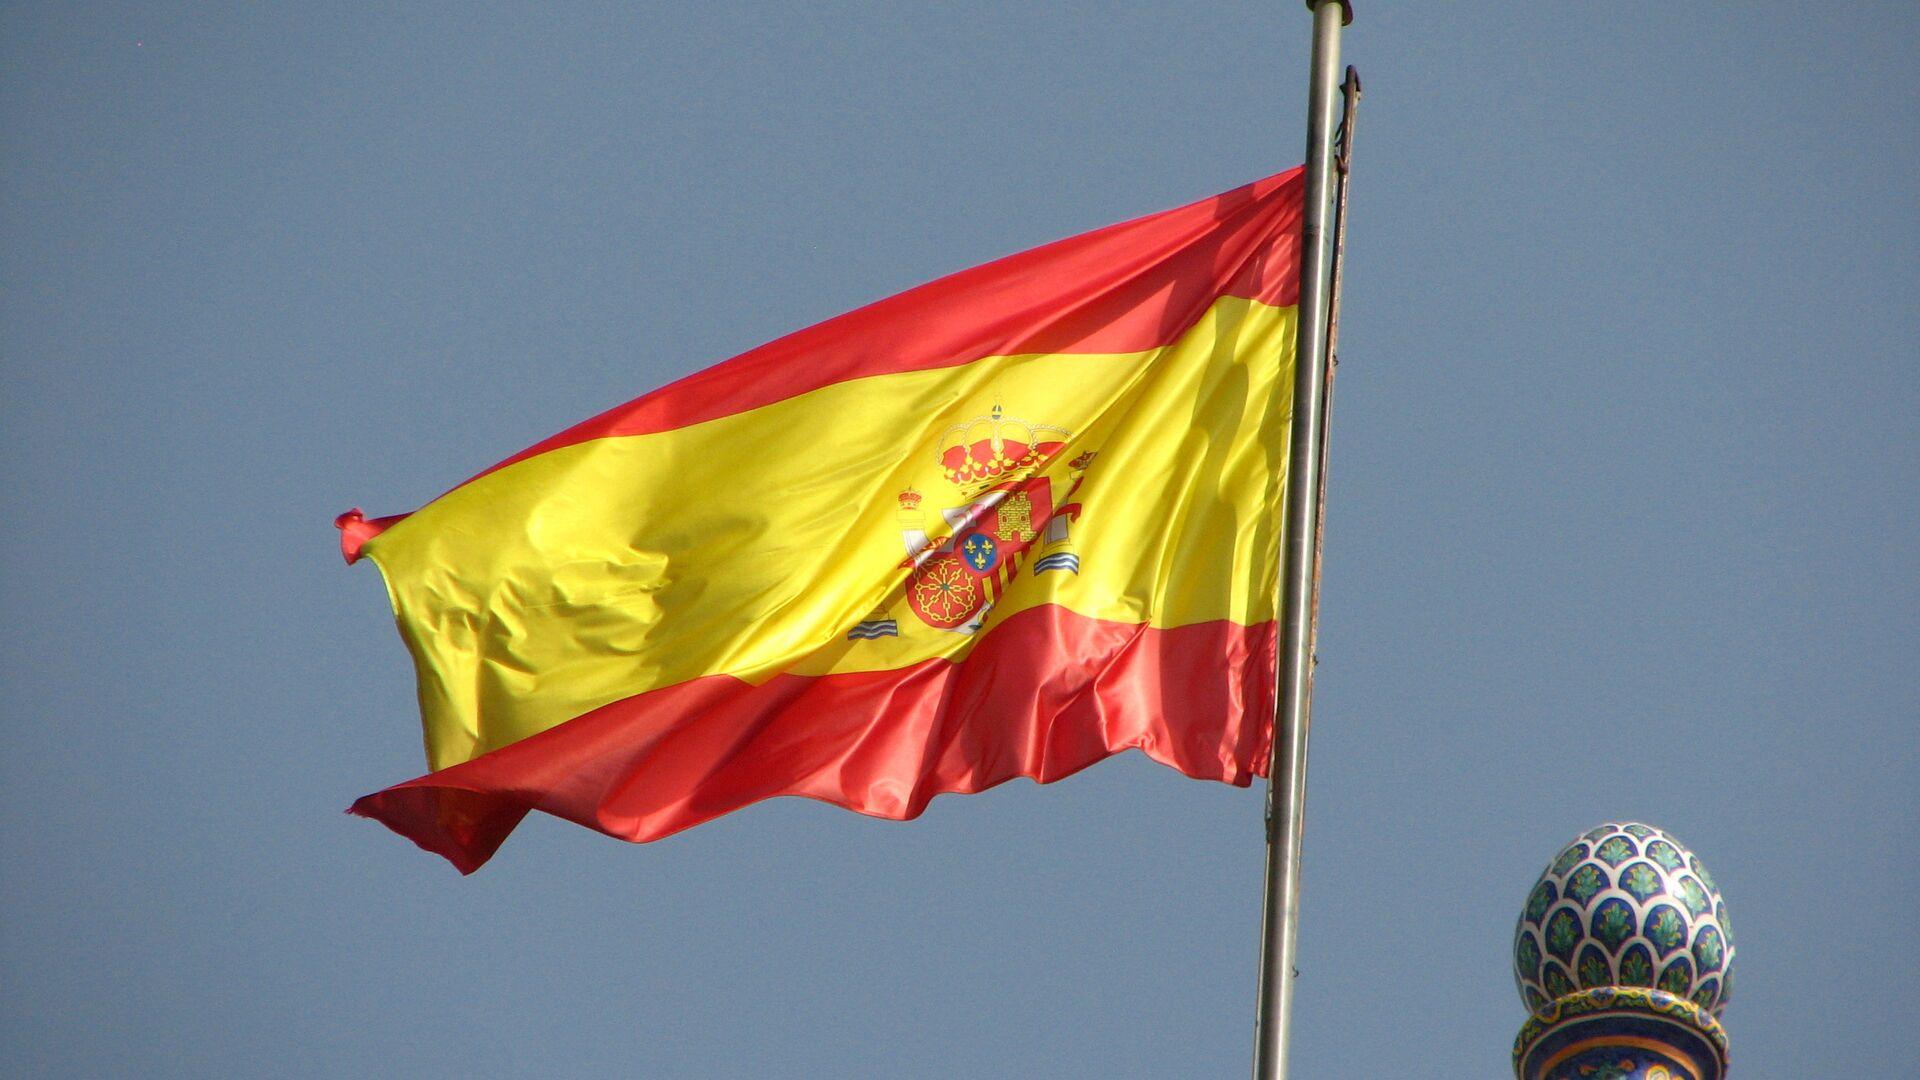 Bandera de España - Sputnik Mundo, 1920, 10.03.2021